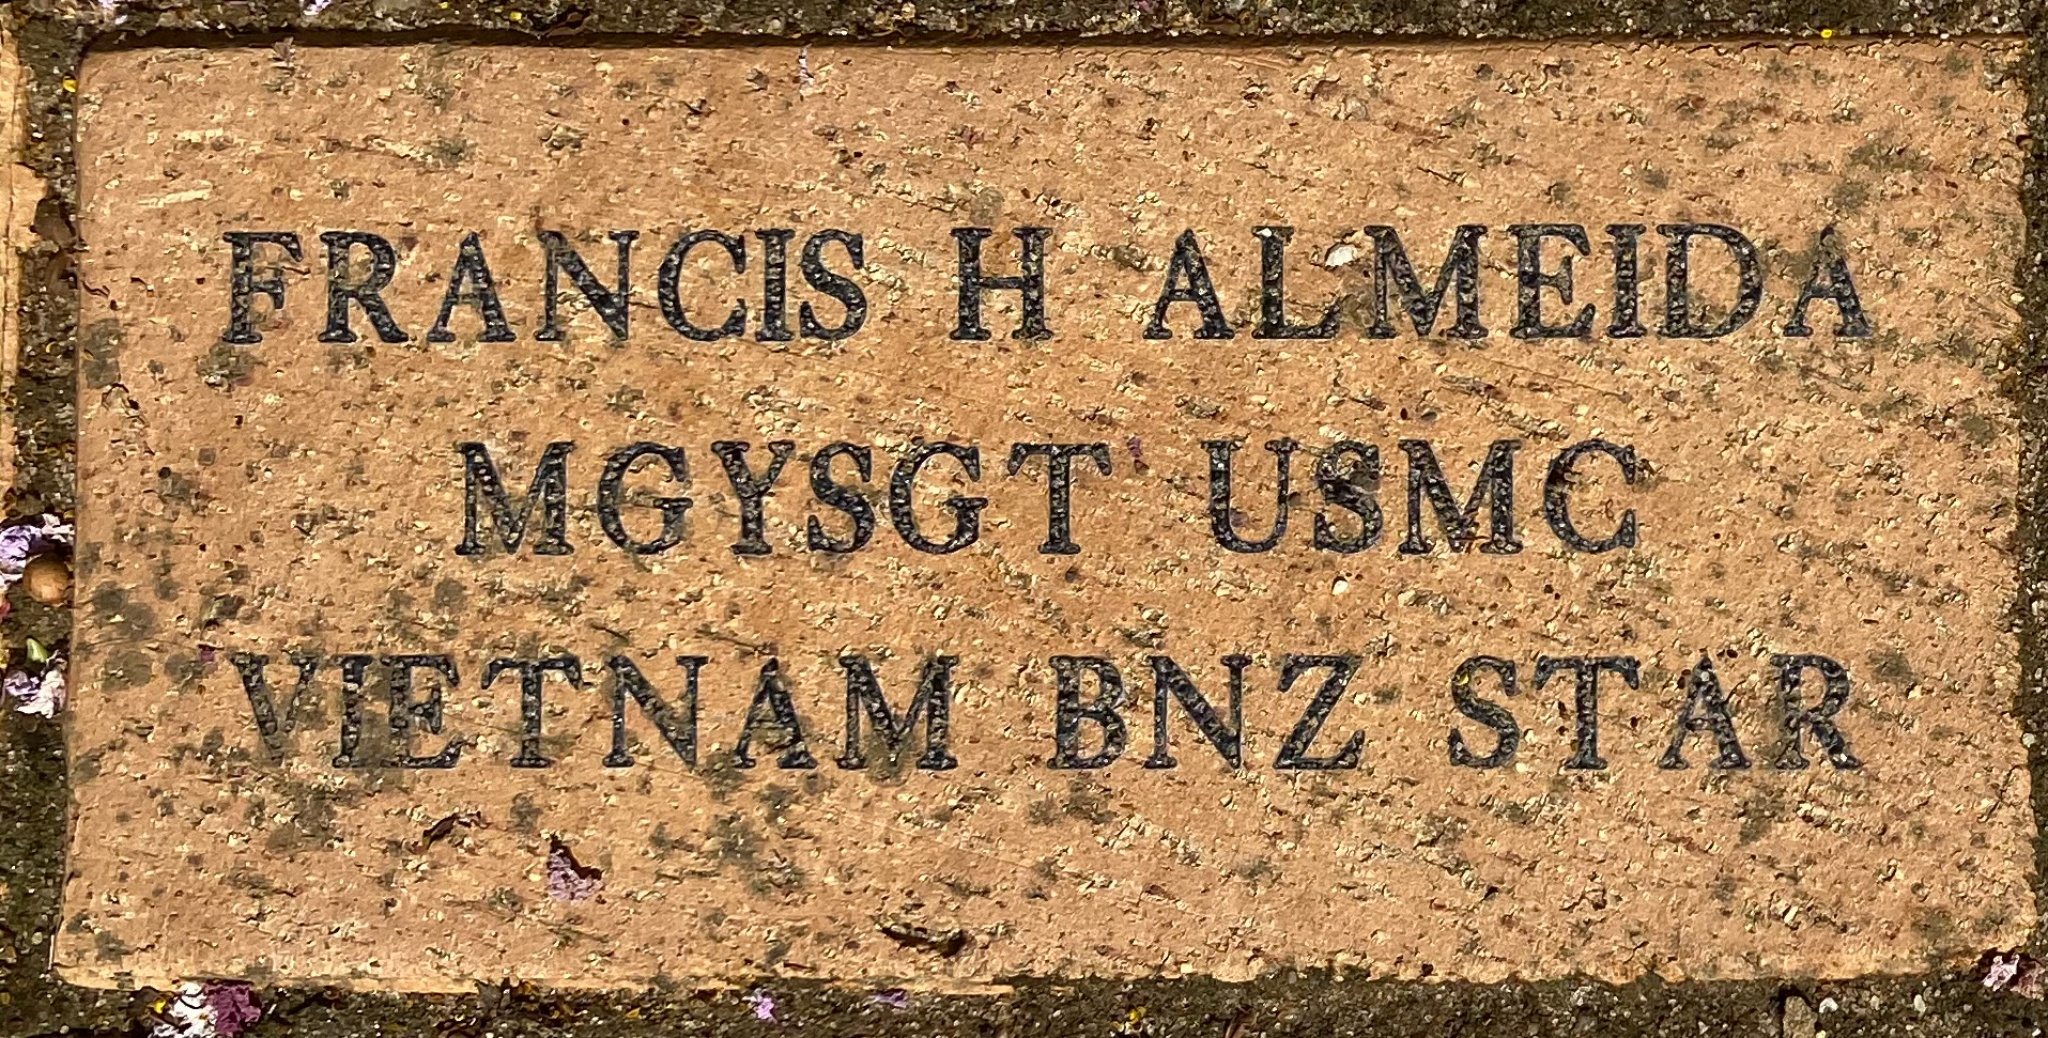 FRANCIS H ALMEIDA MGYSGT USMC VIETNAM BNZ STAR